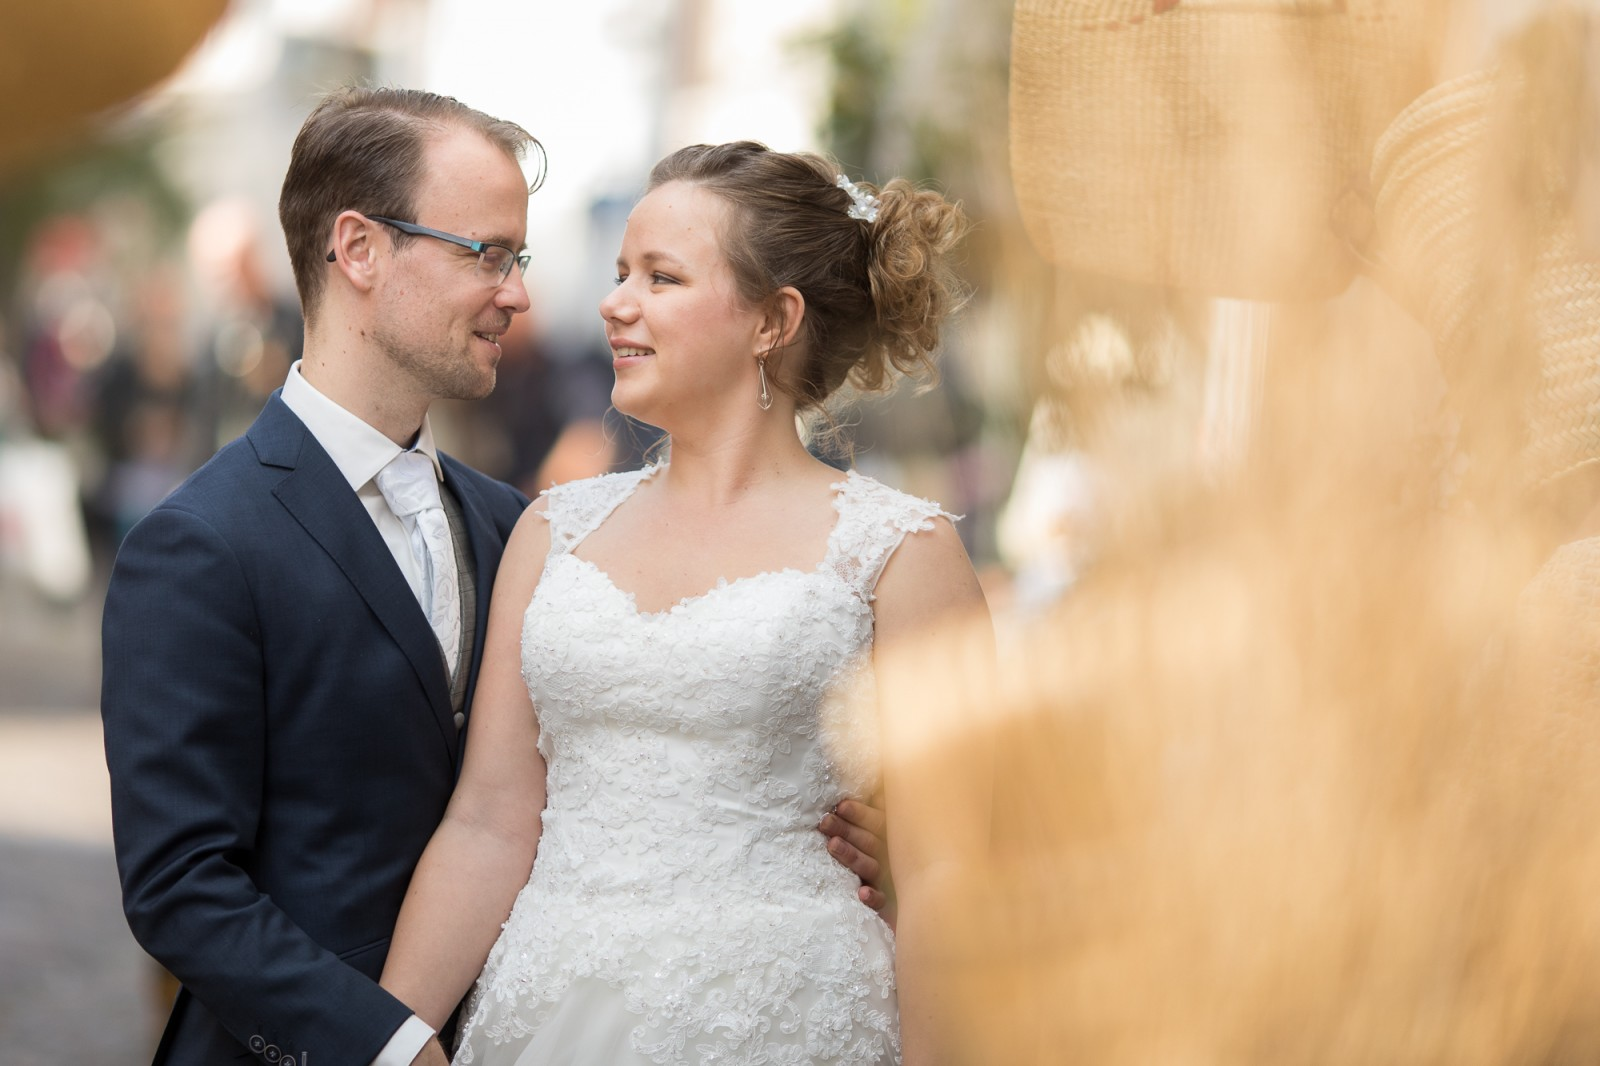 Bruidsreportage van Koen en Marieke